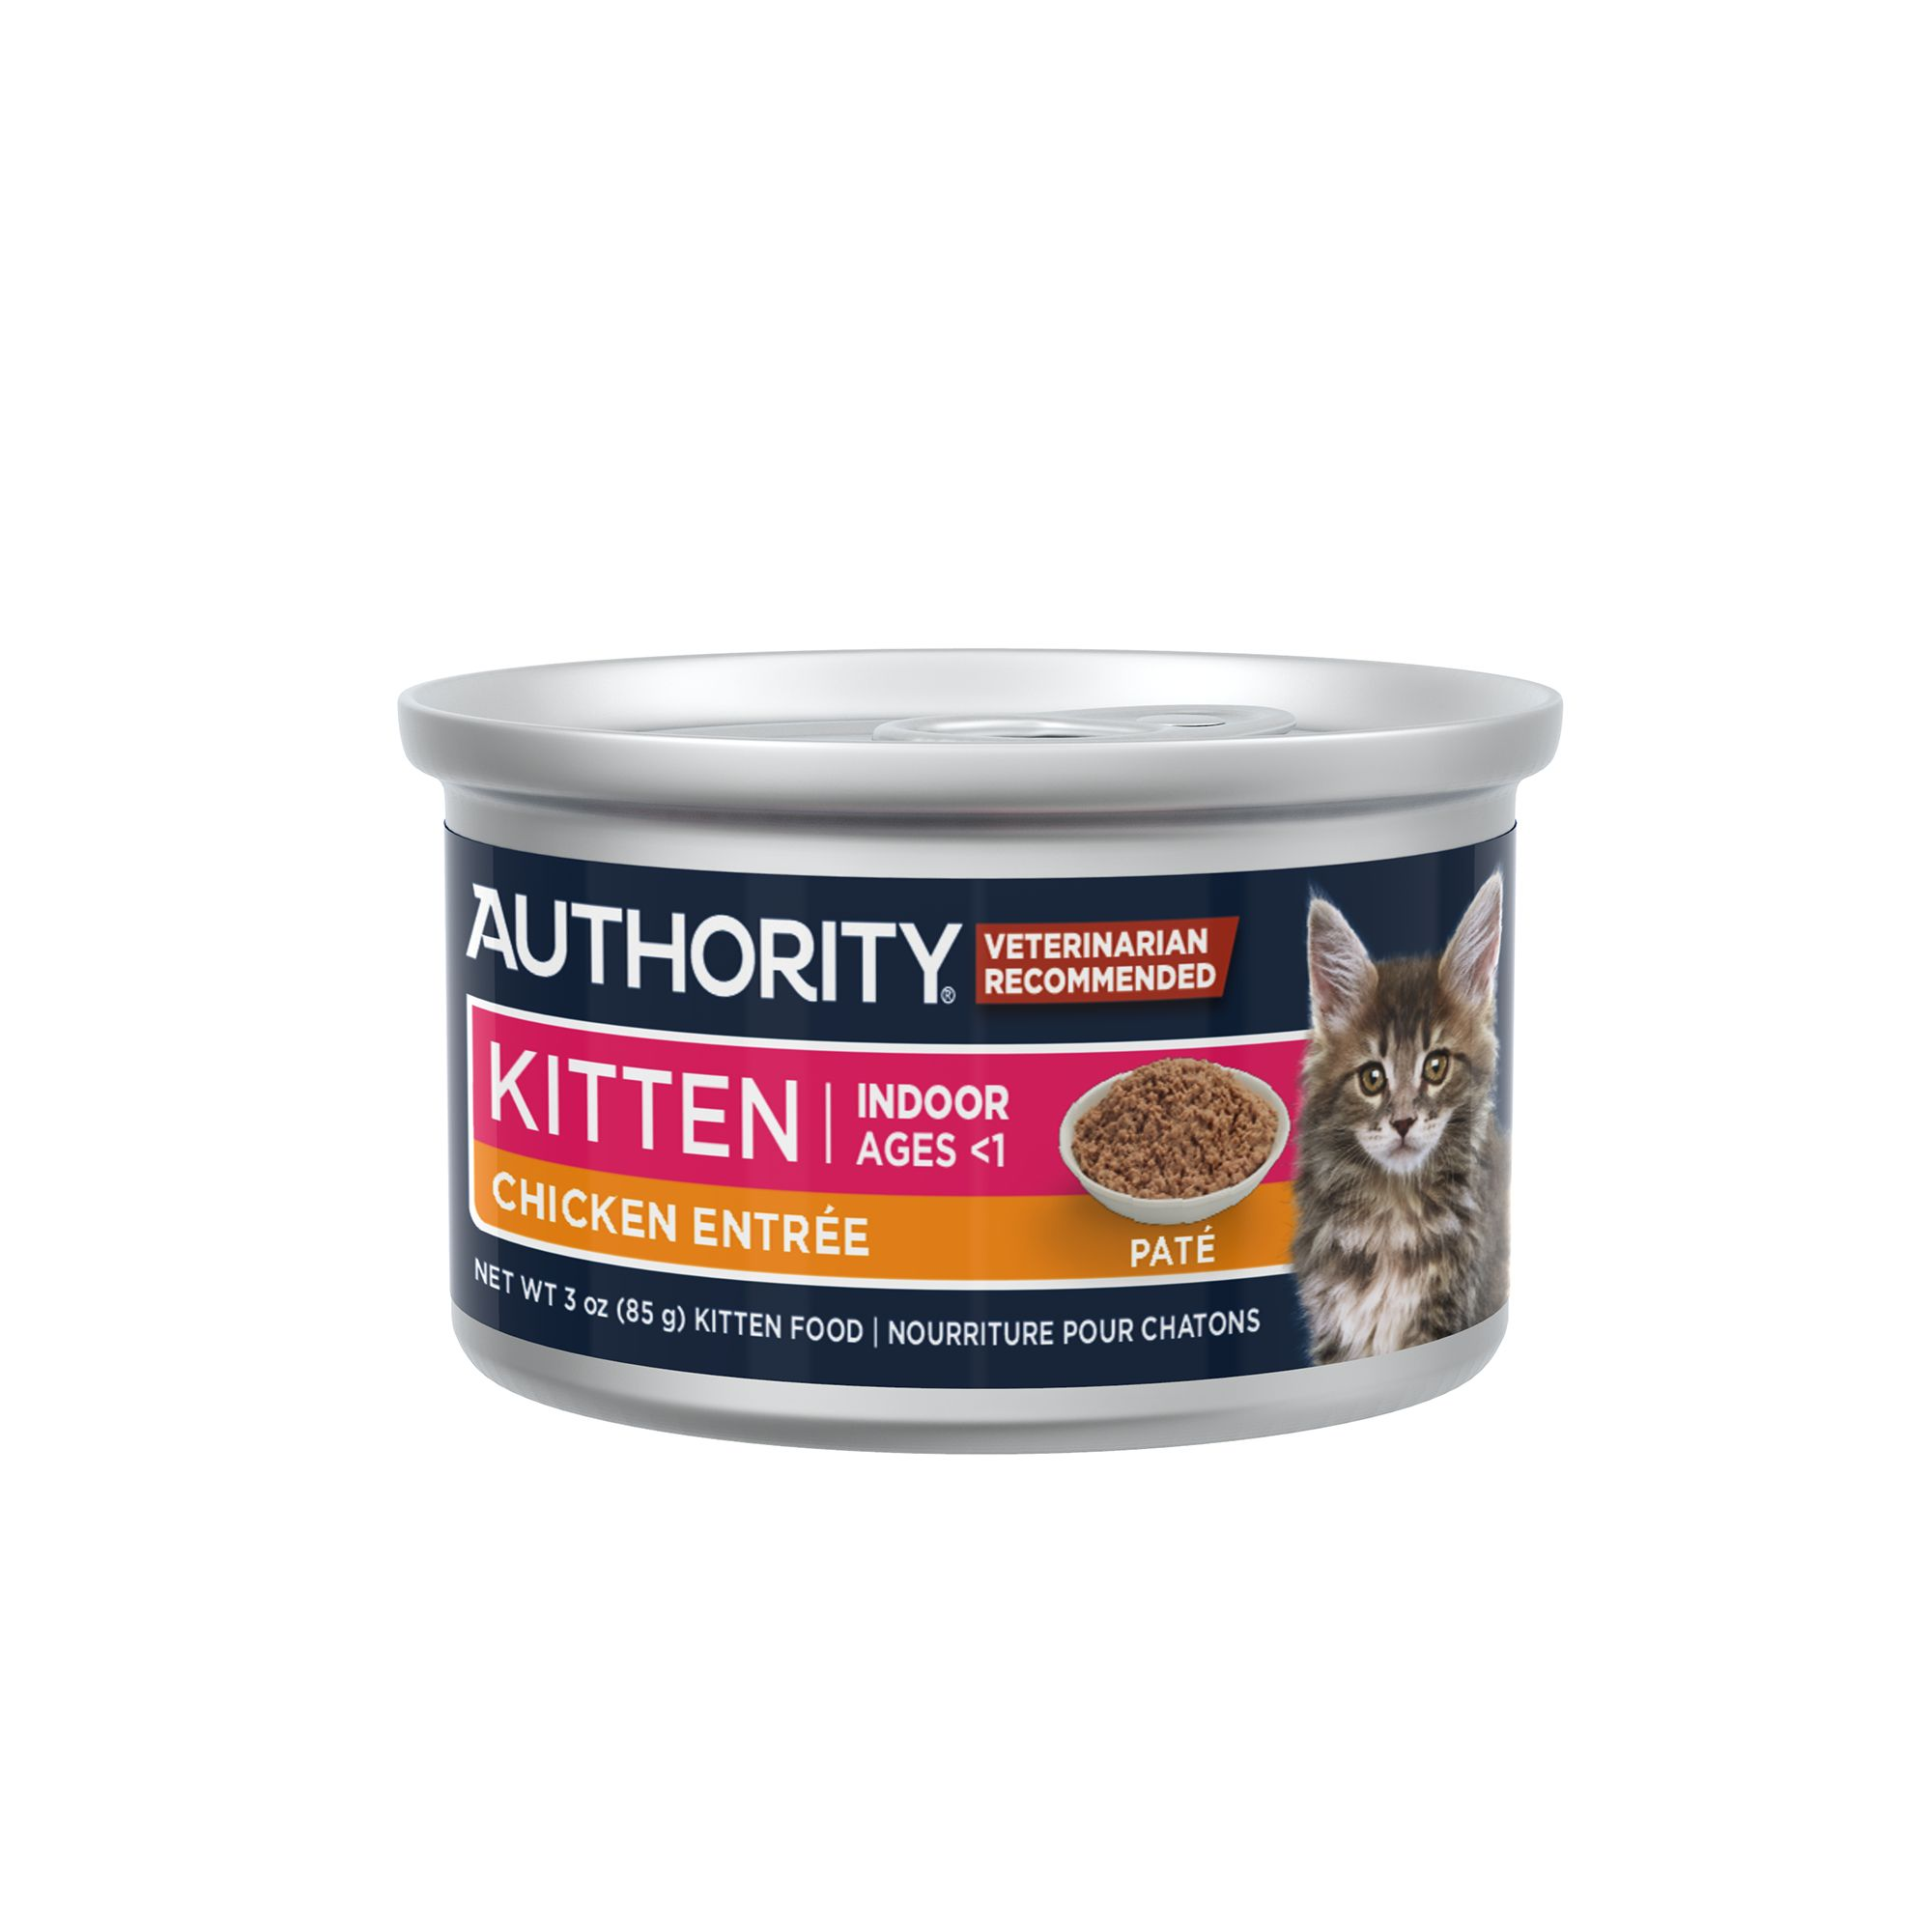 Authority Pate Entree Kitten Food Cat Wet Food Petsmart